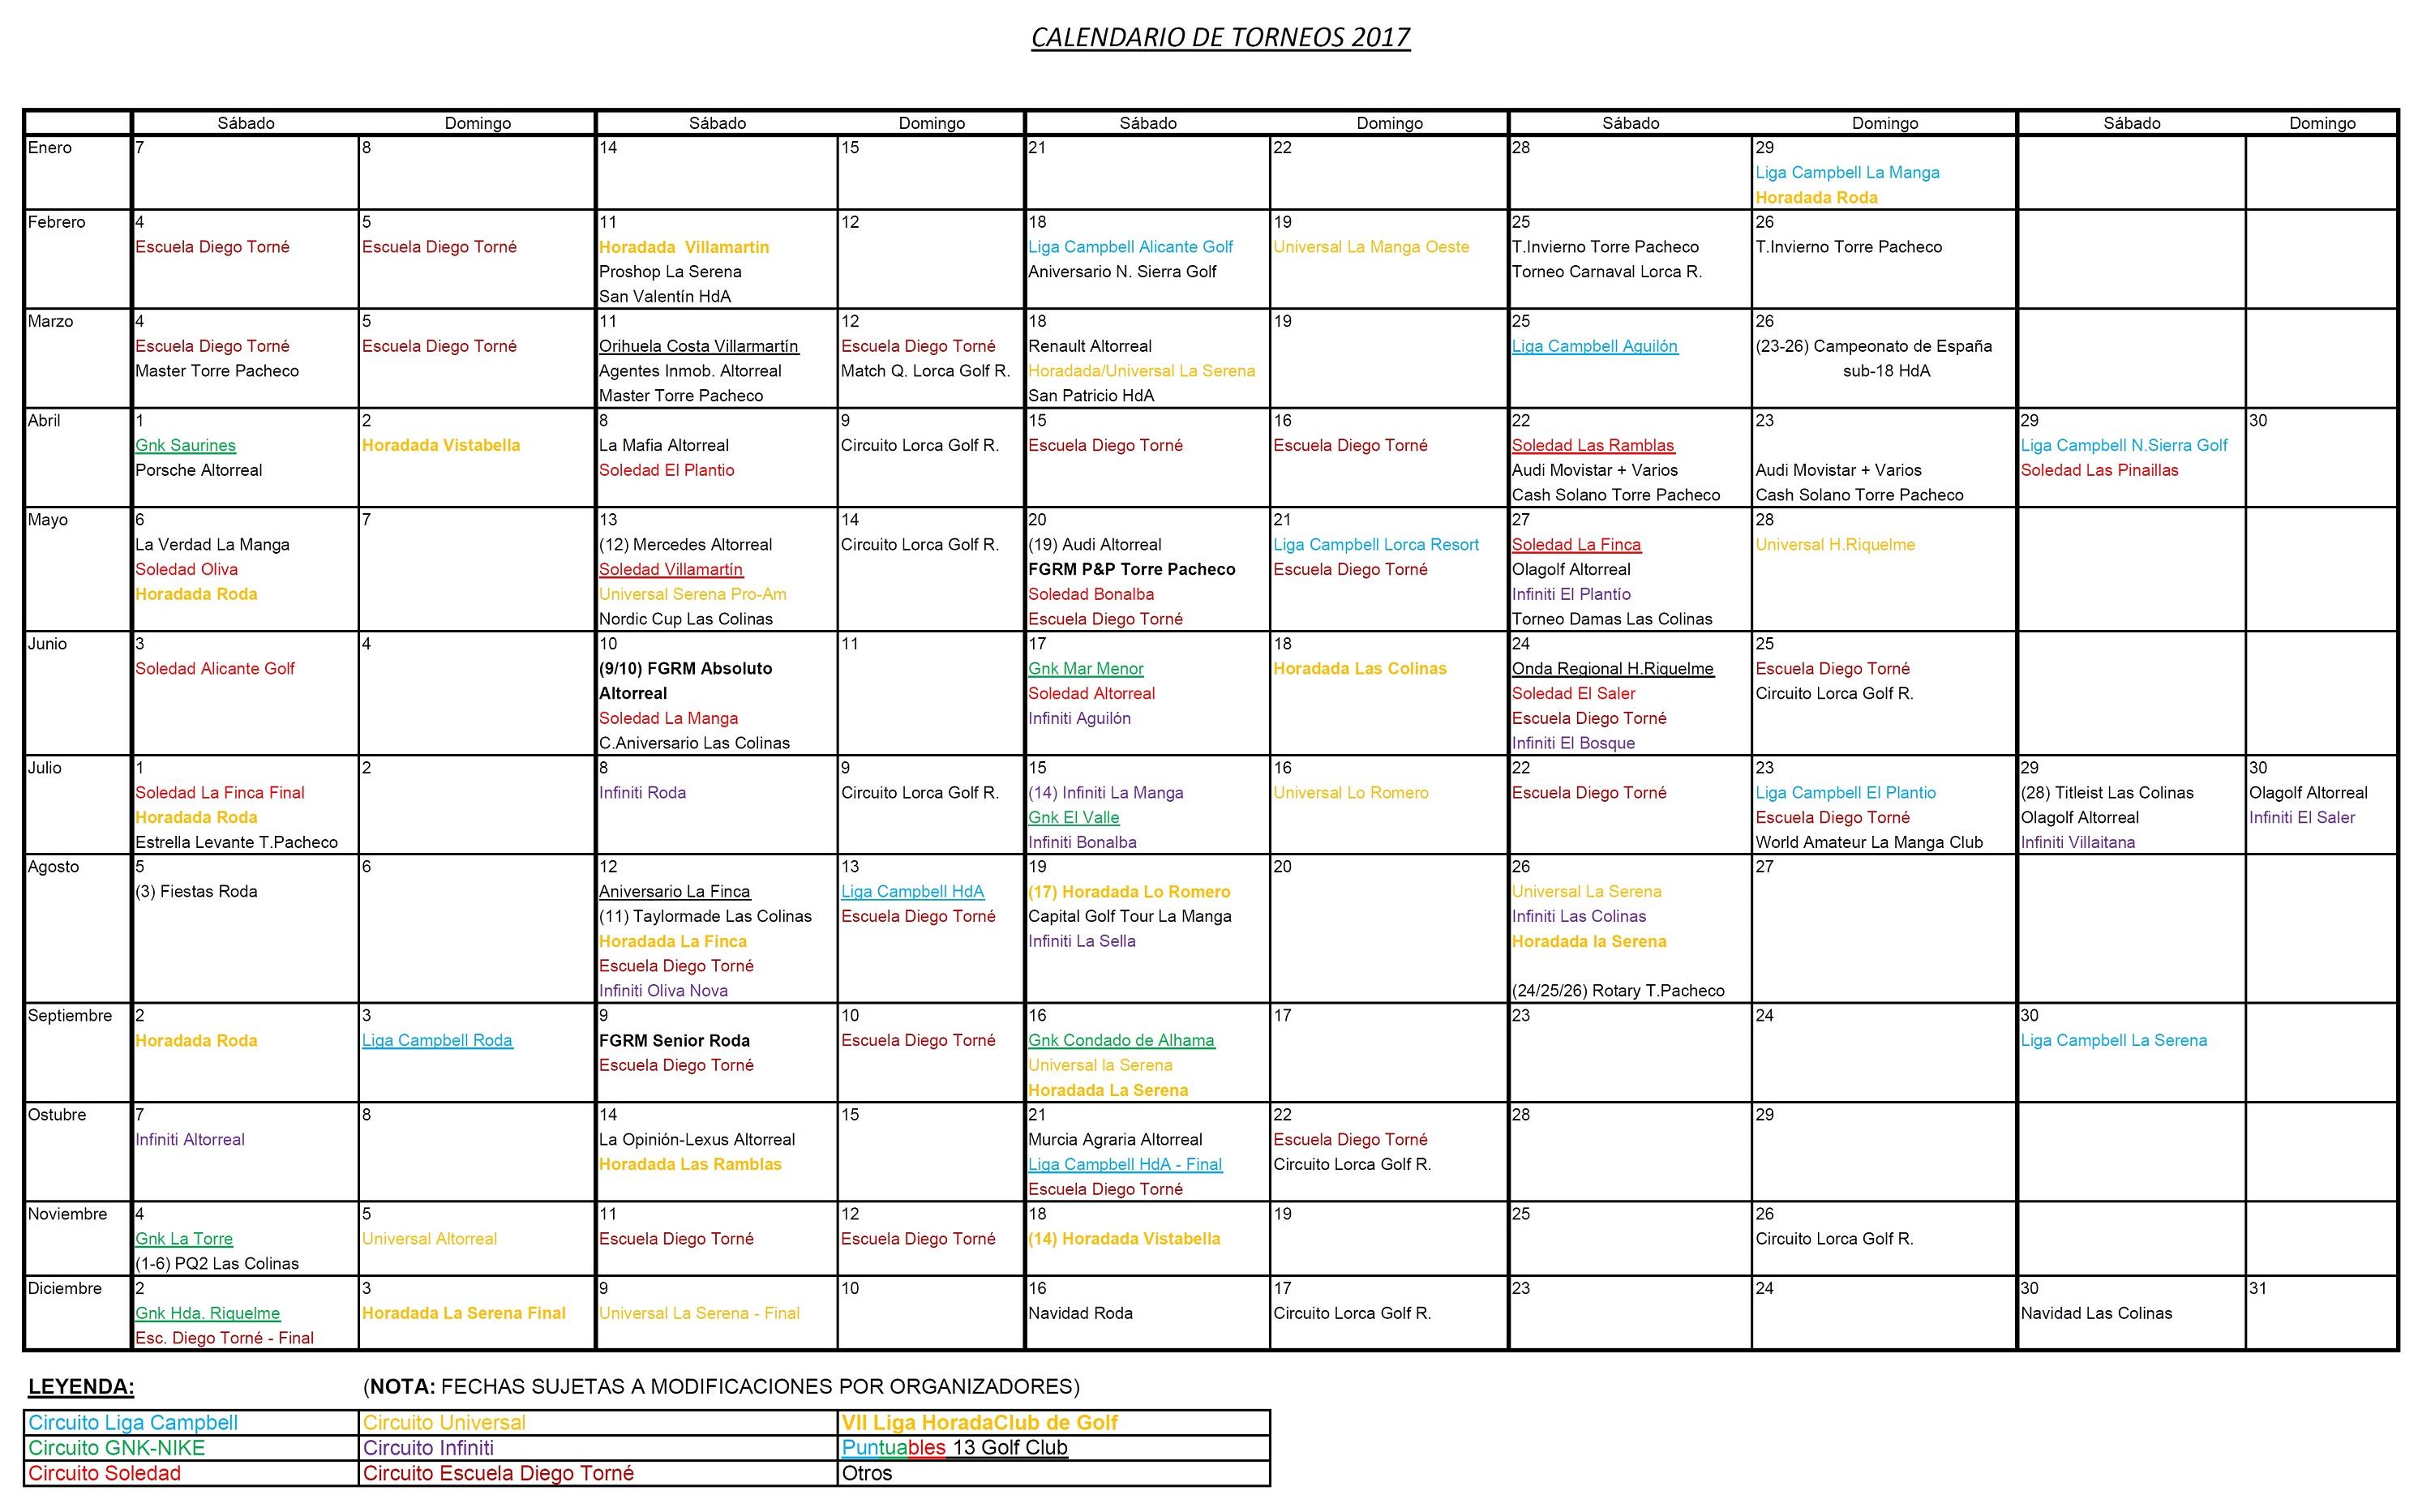 170314 Calendario Torneos